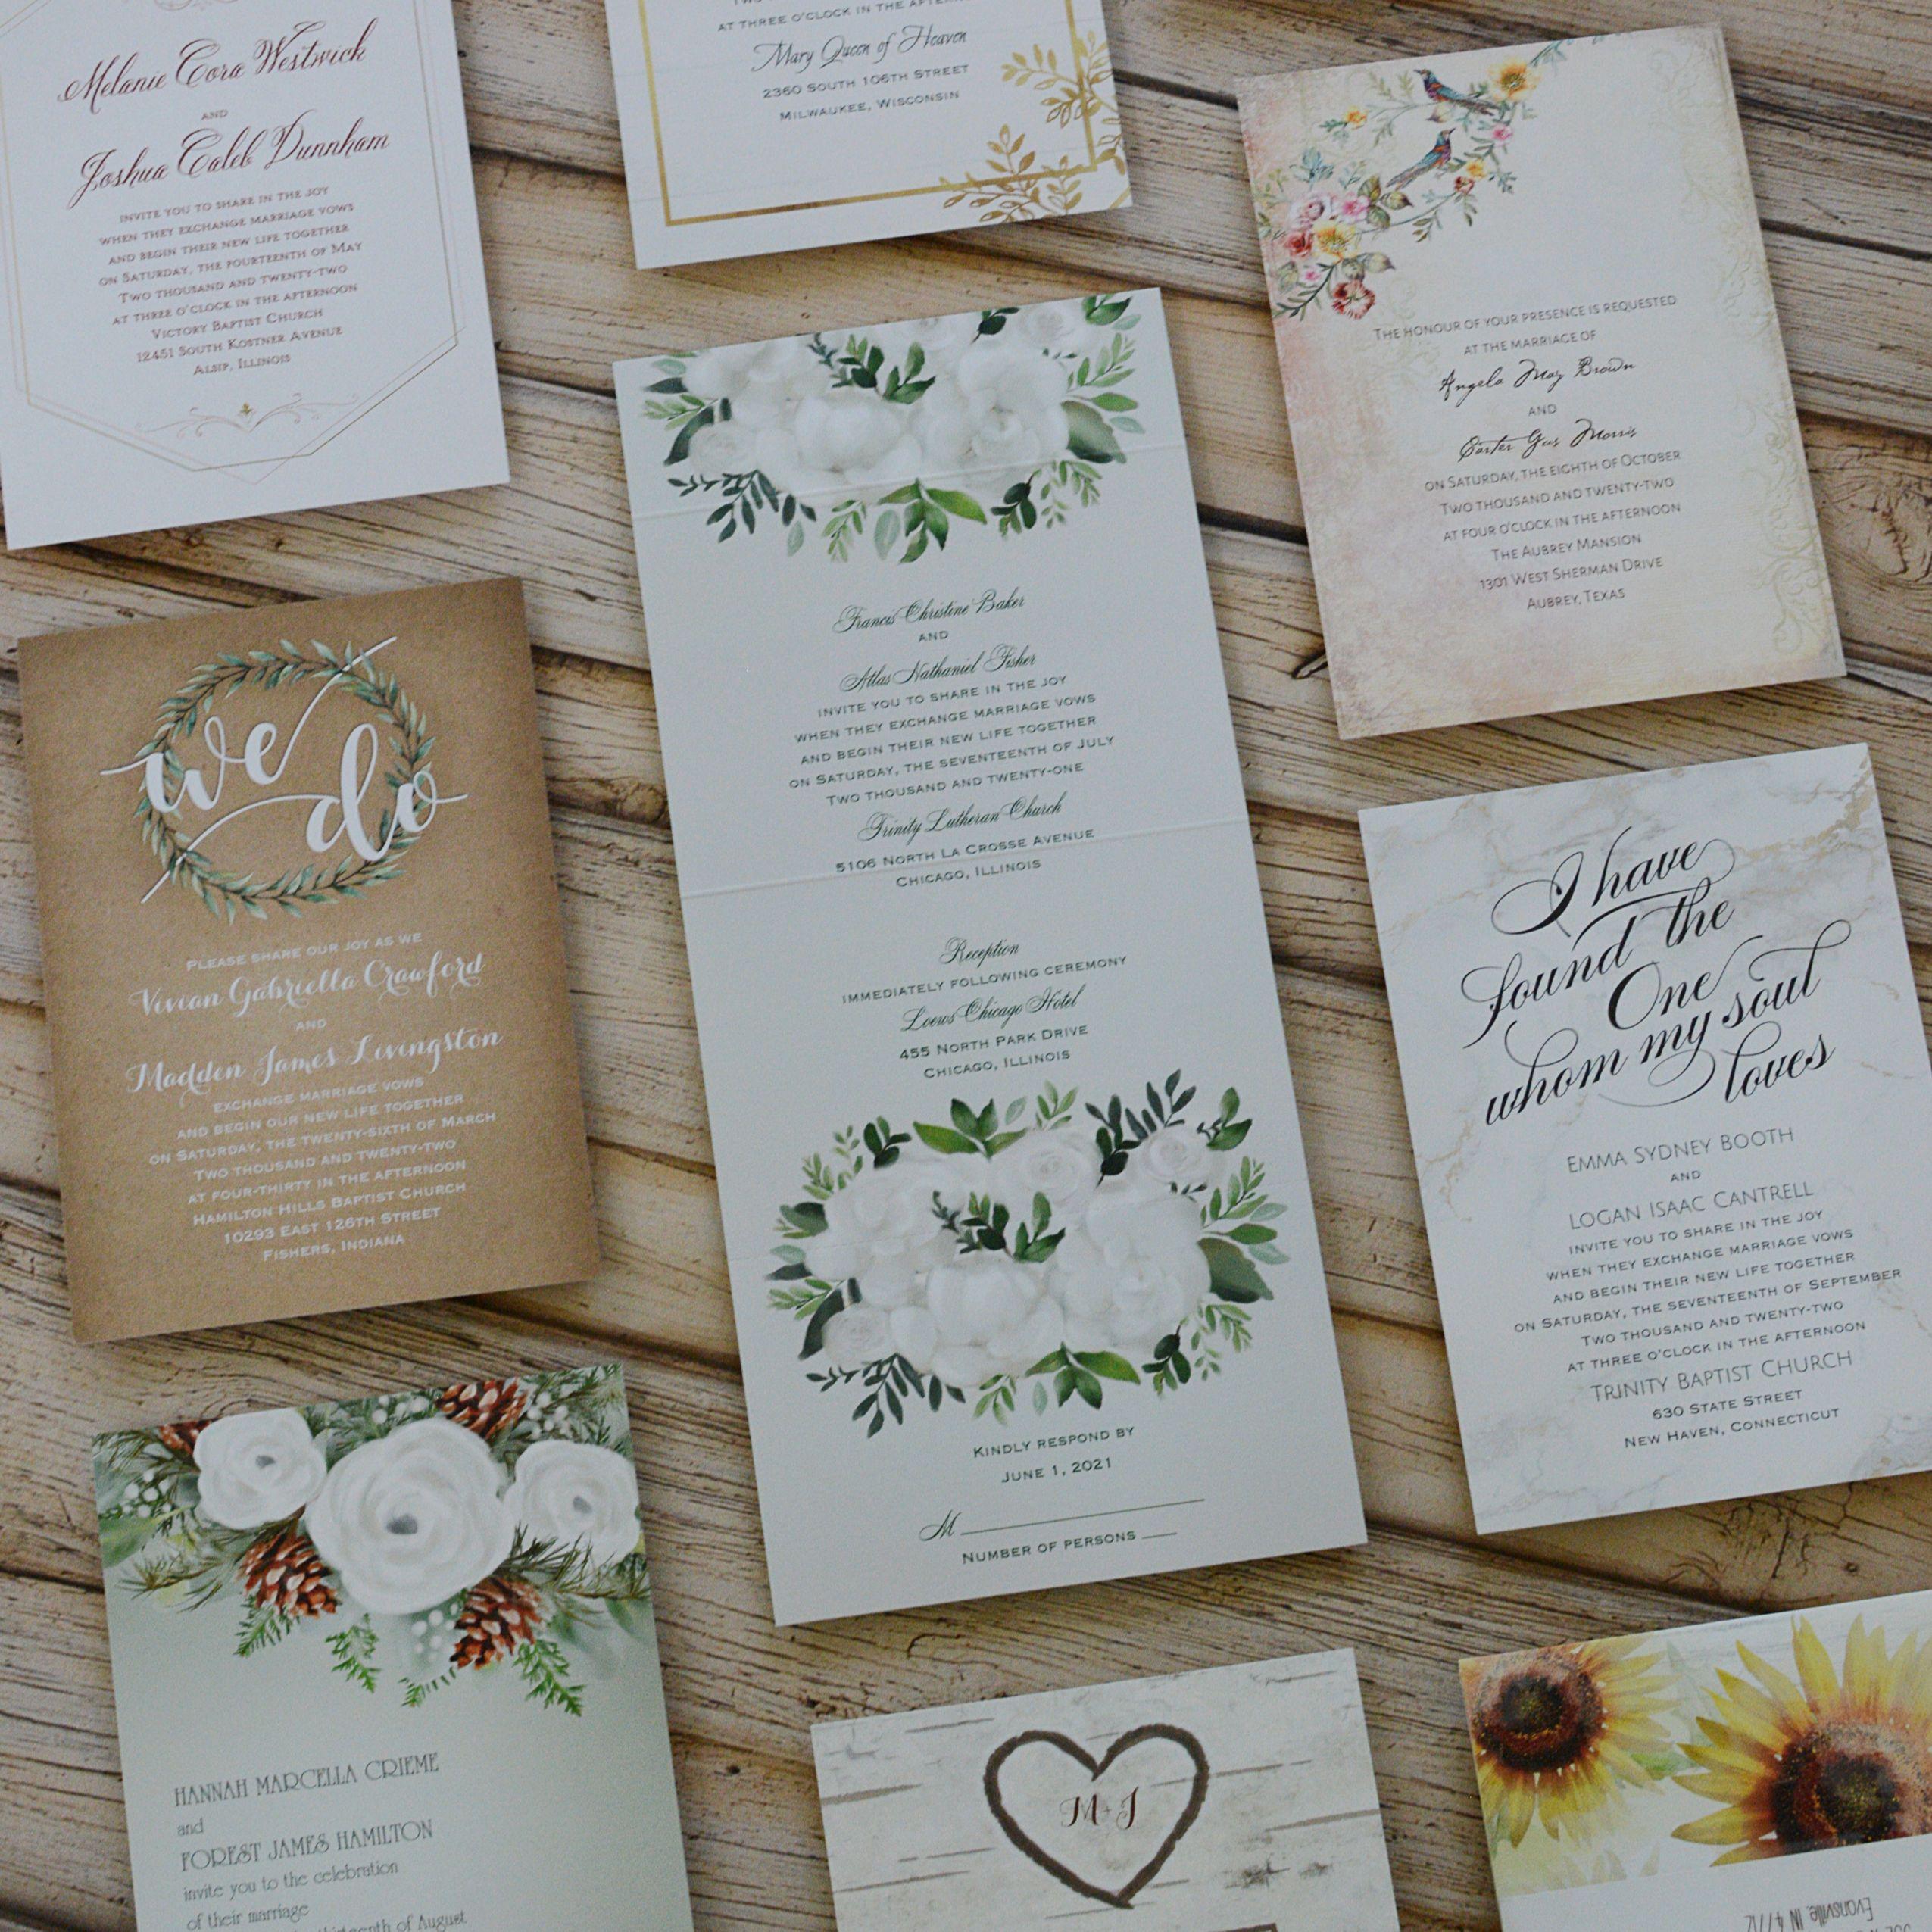 Rustic Wedding Invitations Wedding Invitations Rustic Rustic Wedding Wedding Invitations